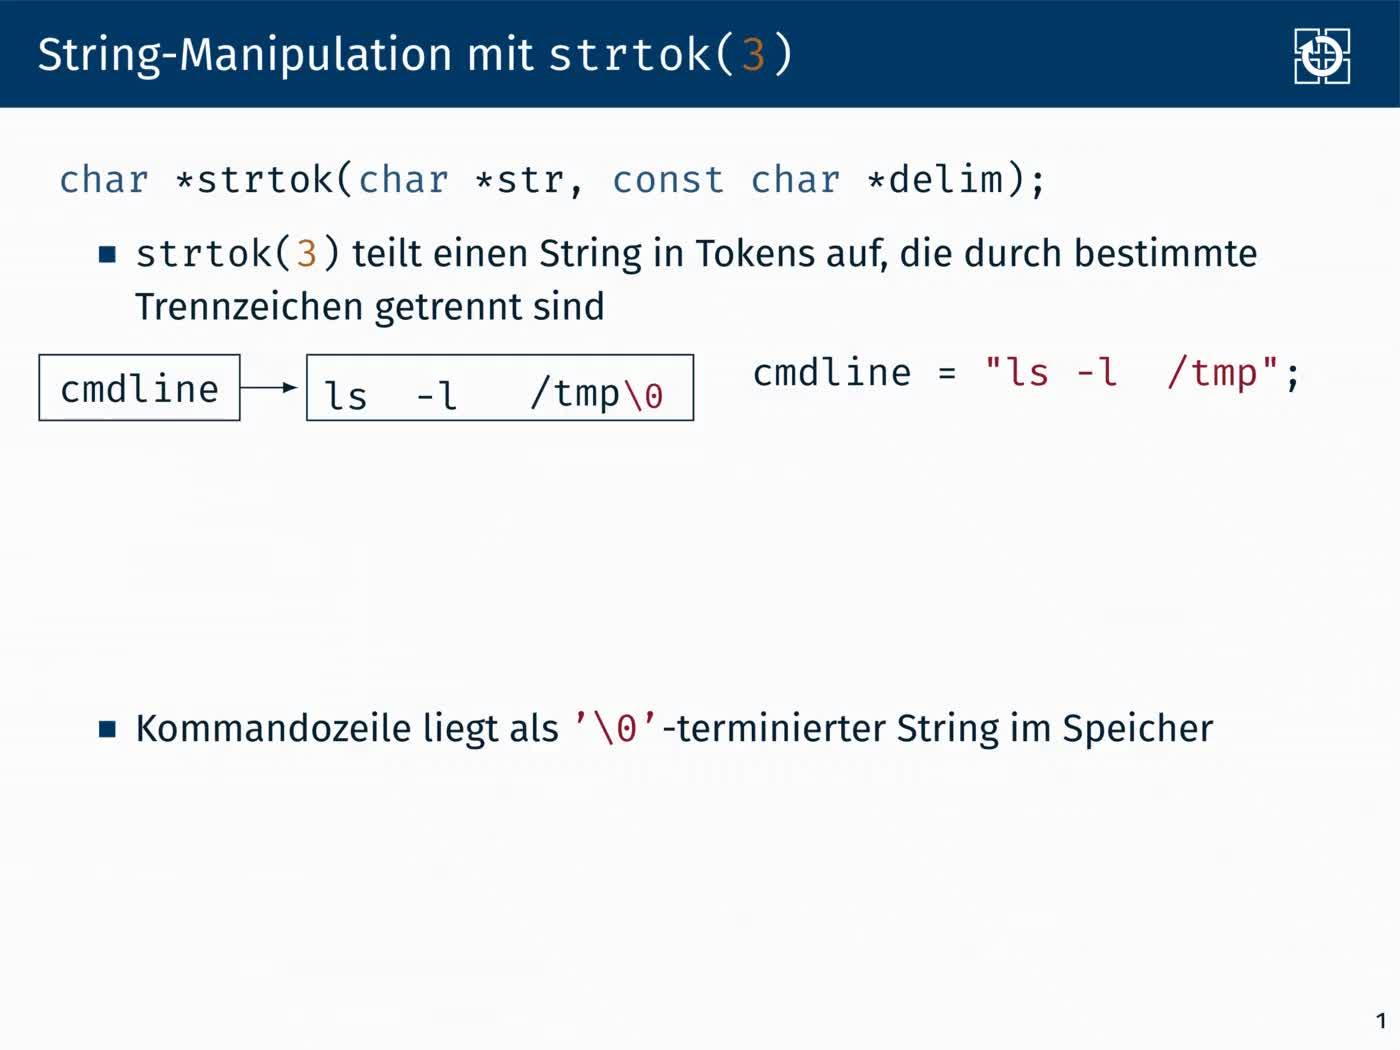 4.3 Prozesse: Stringmanipulation mit strtok(3) preview image